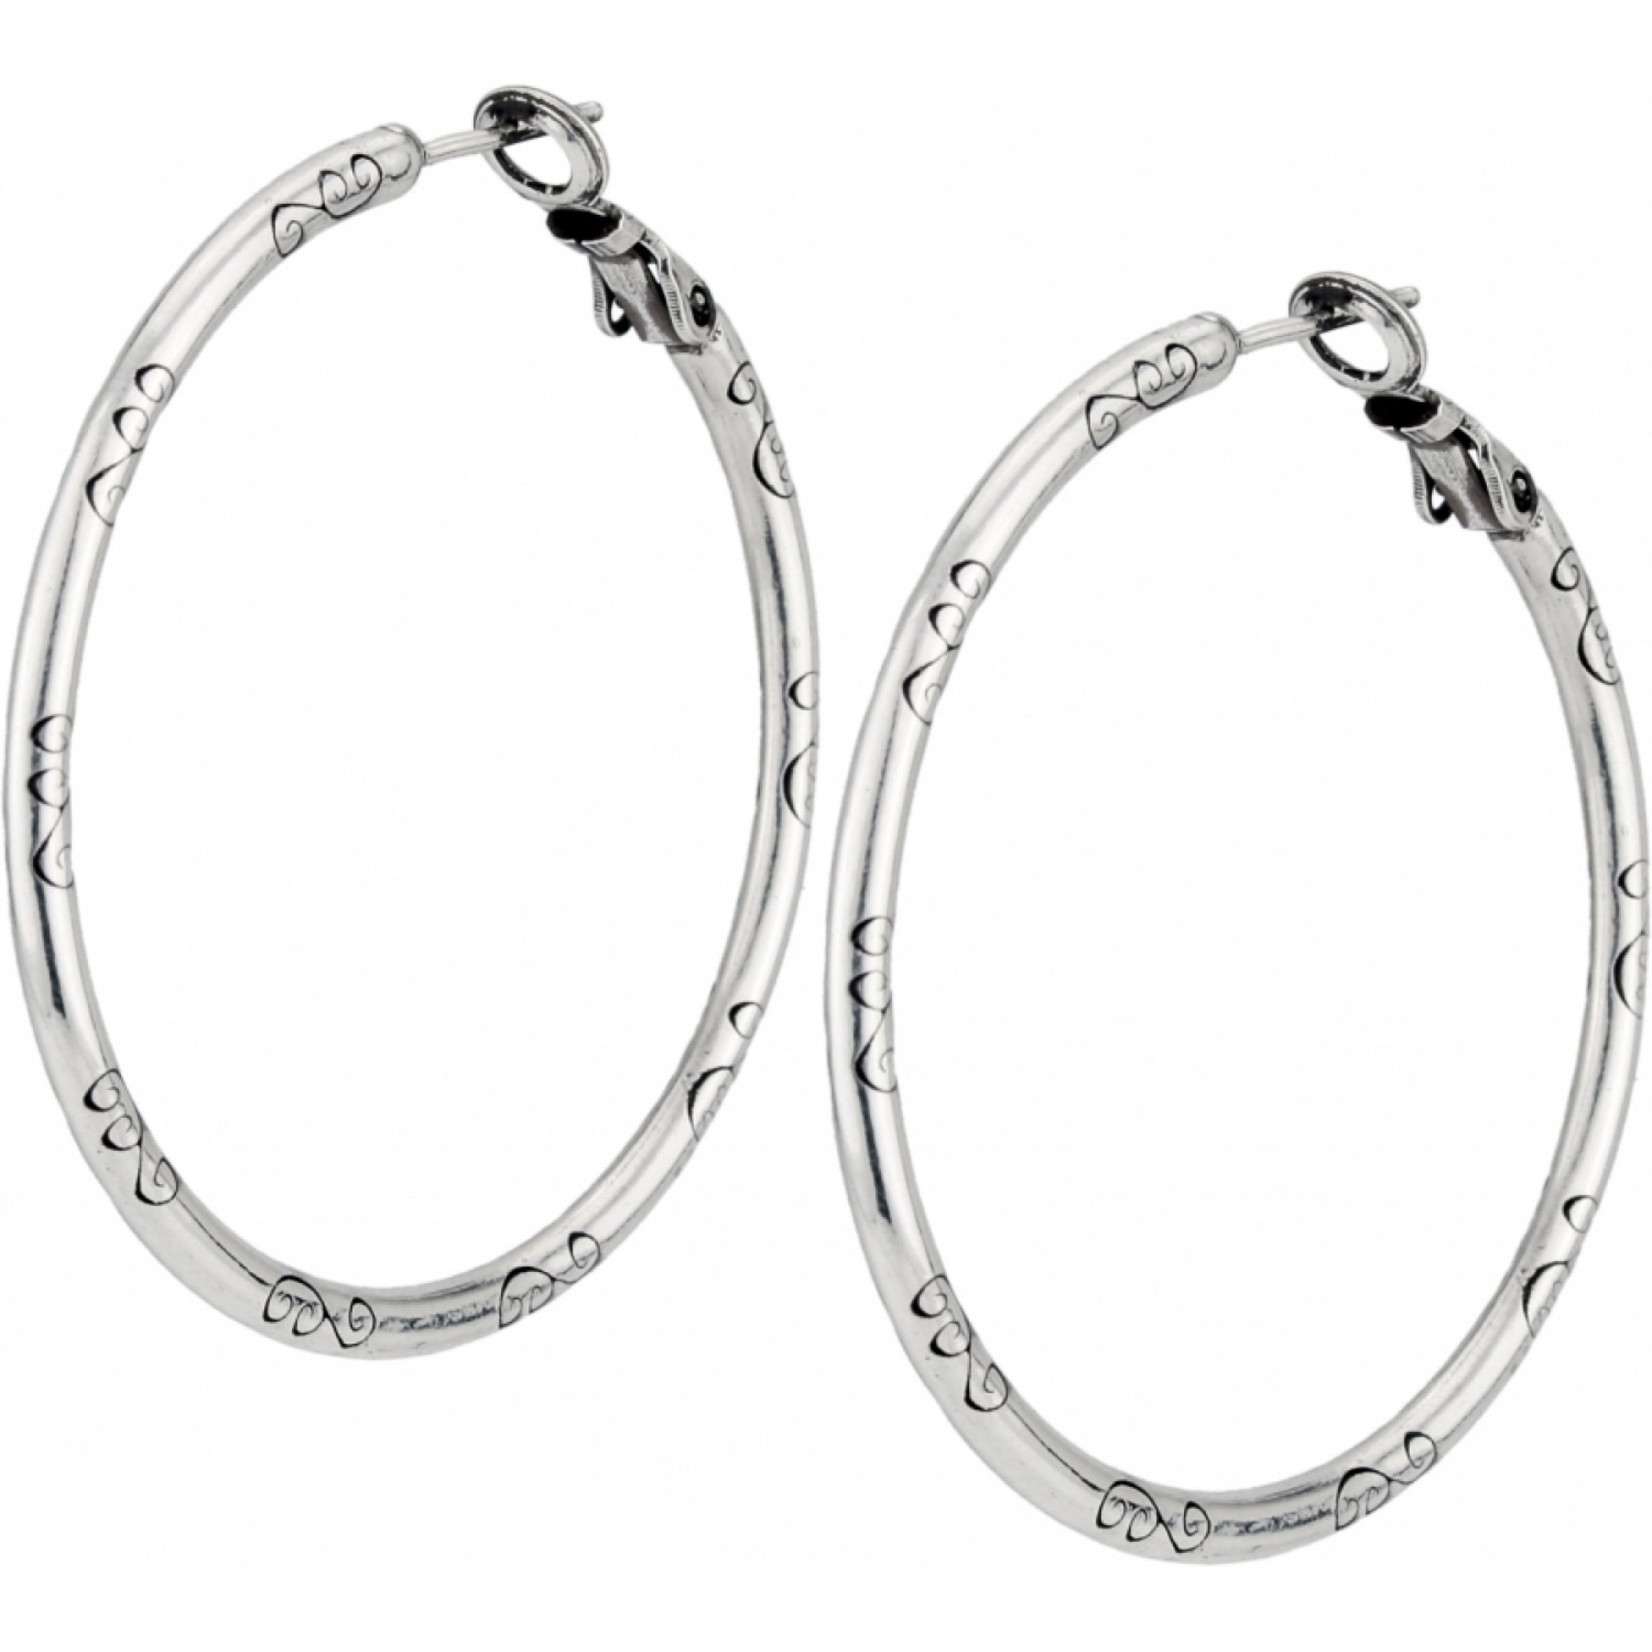 Brighton Large Earring Charm Hoop Silver